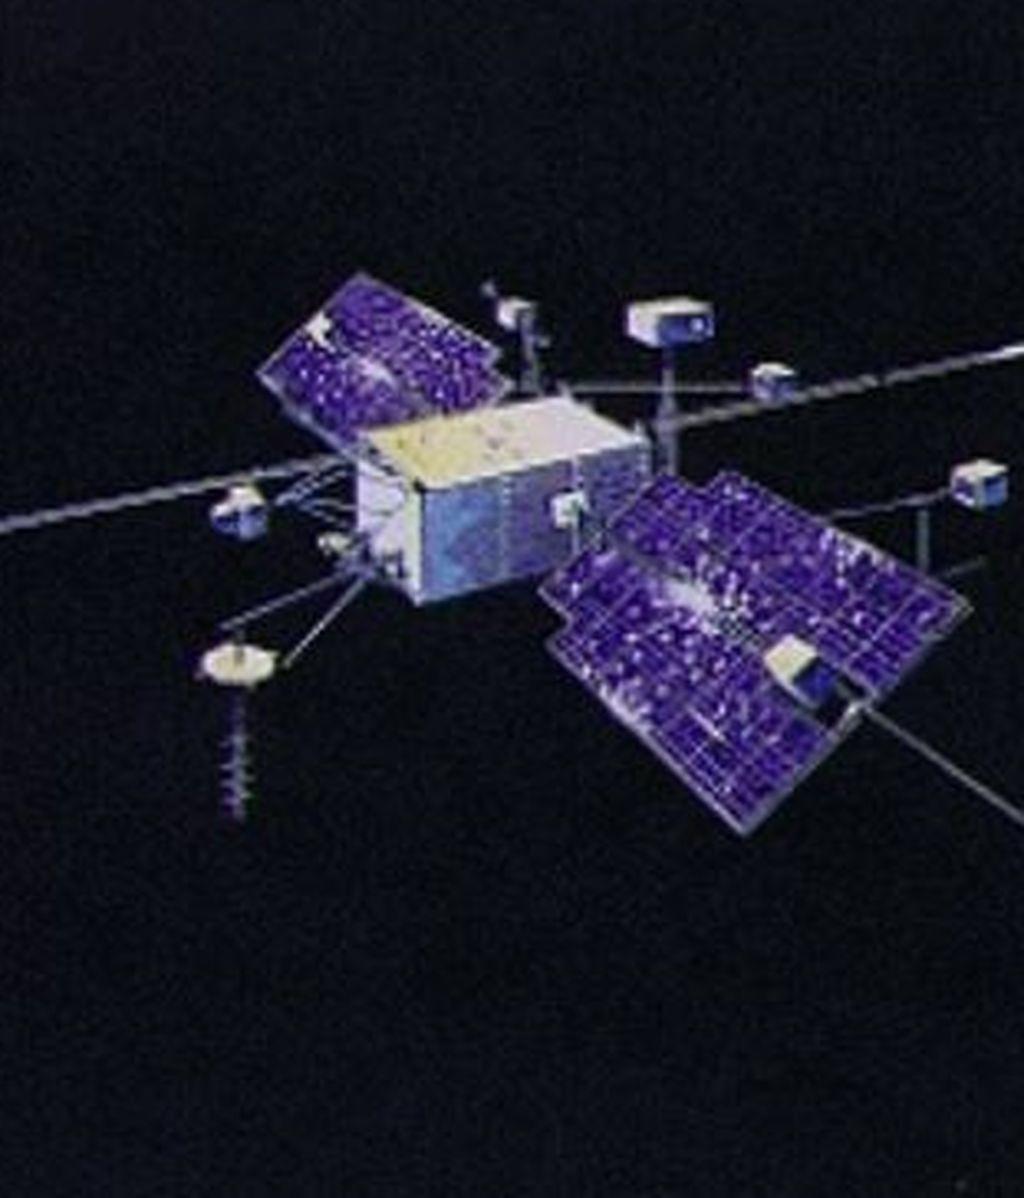 EuropaPress_3294588_impresion_artista_observatorio_geofisico_orbital_orbita